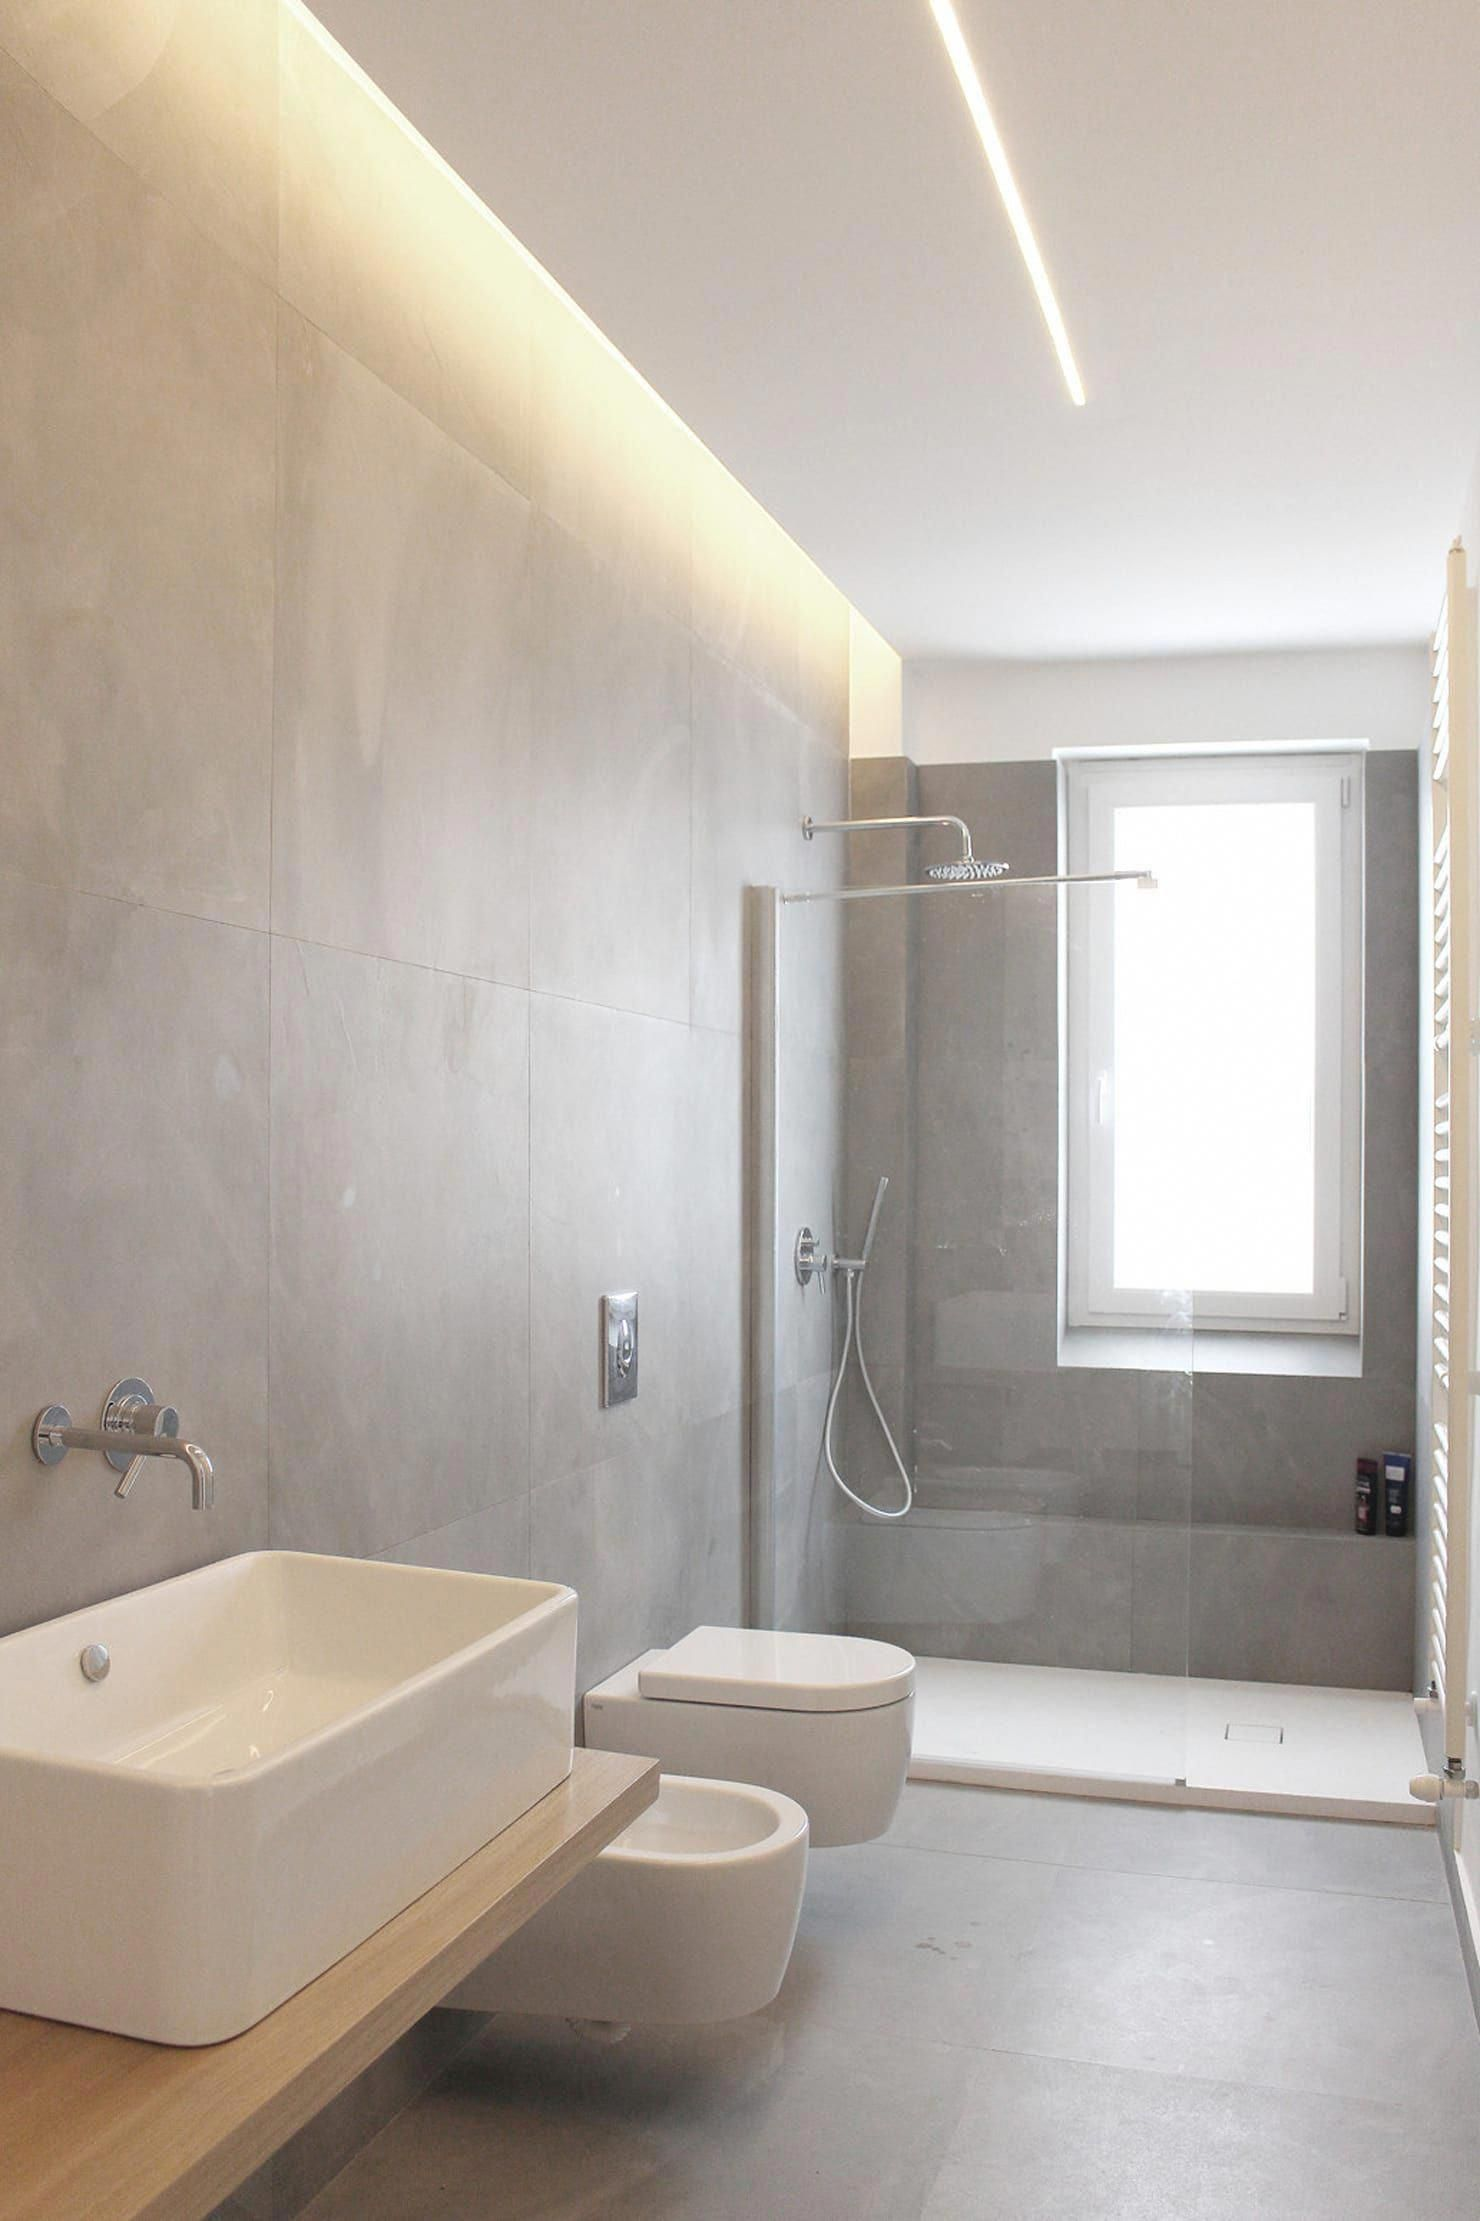 Donate provided bathroom makeover in 2020 Bathroom